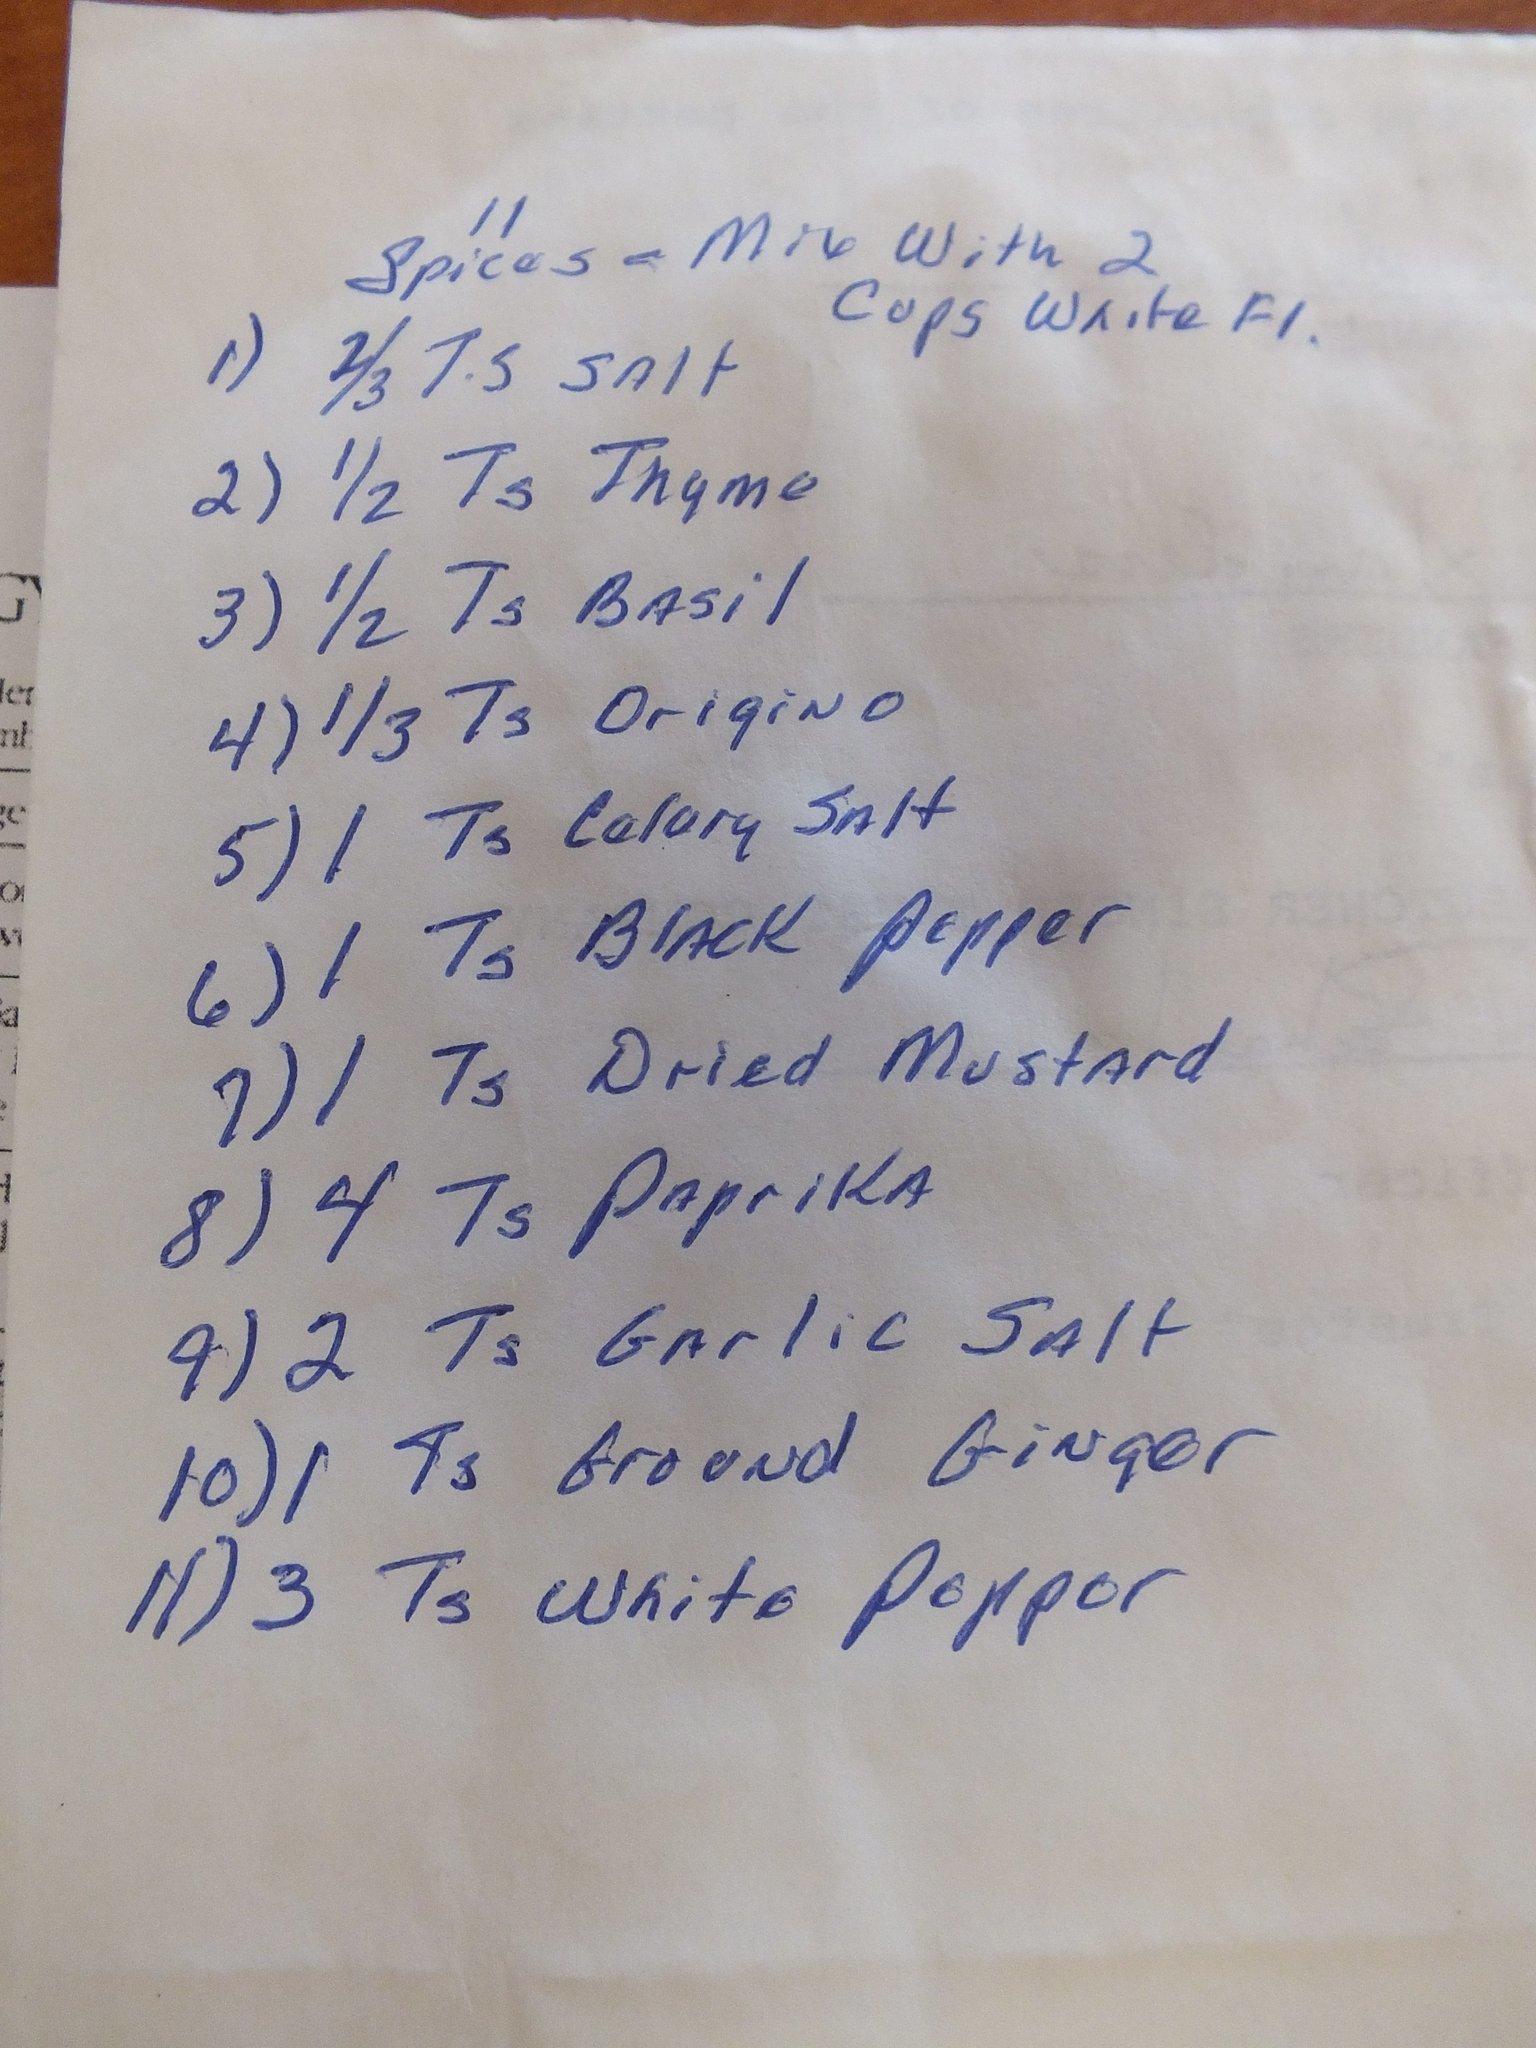 KFC Recipe Revealed? Tribune Shown Family Scrapbook With